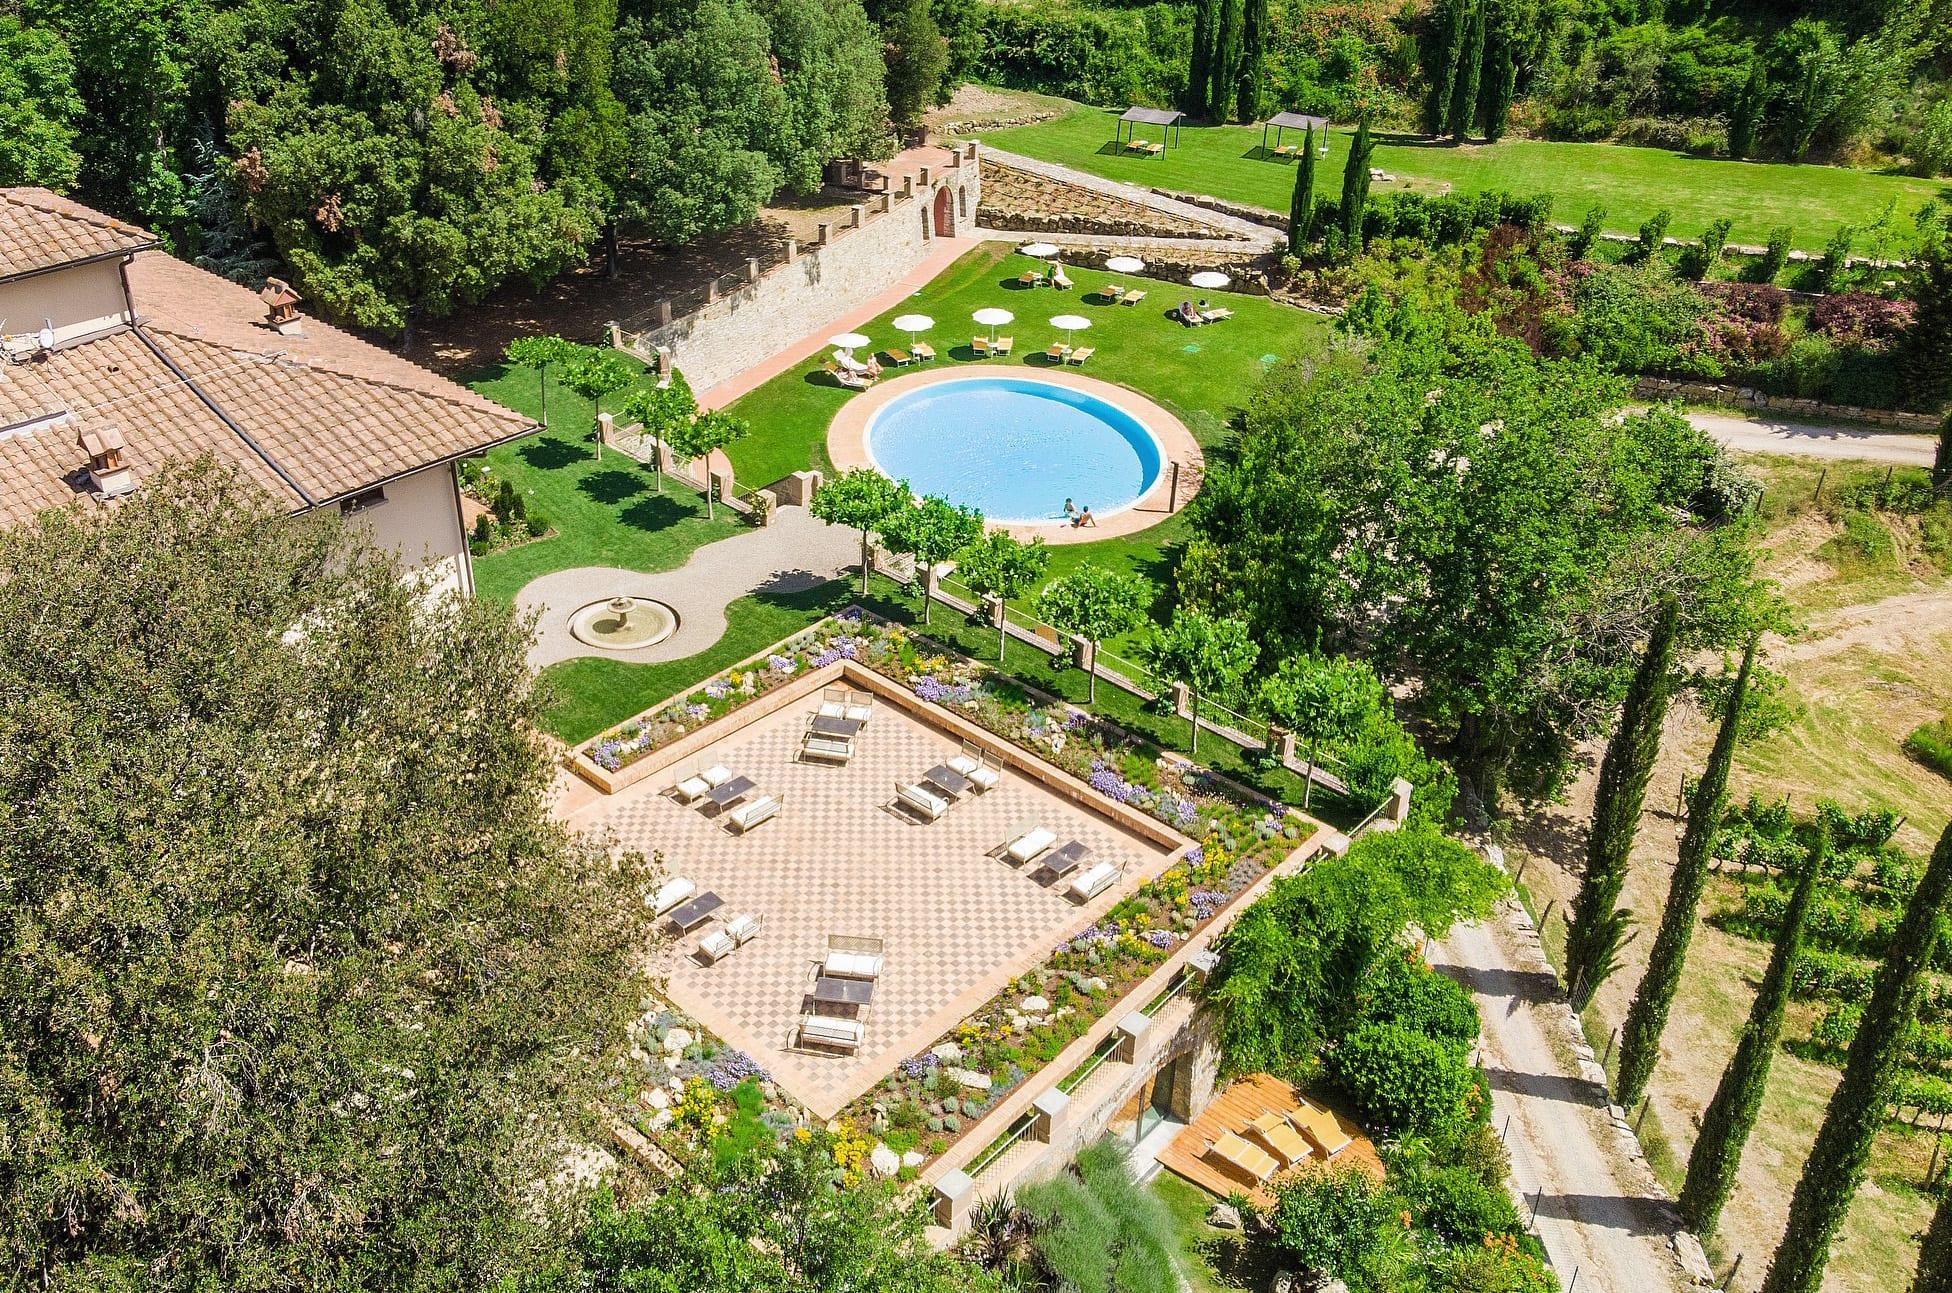 http://www.hotelvillacampomaggio.it/wp-content/uploads/2016/05/SKY-LARGE.jpg